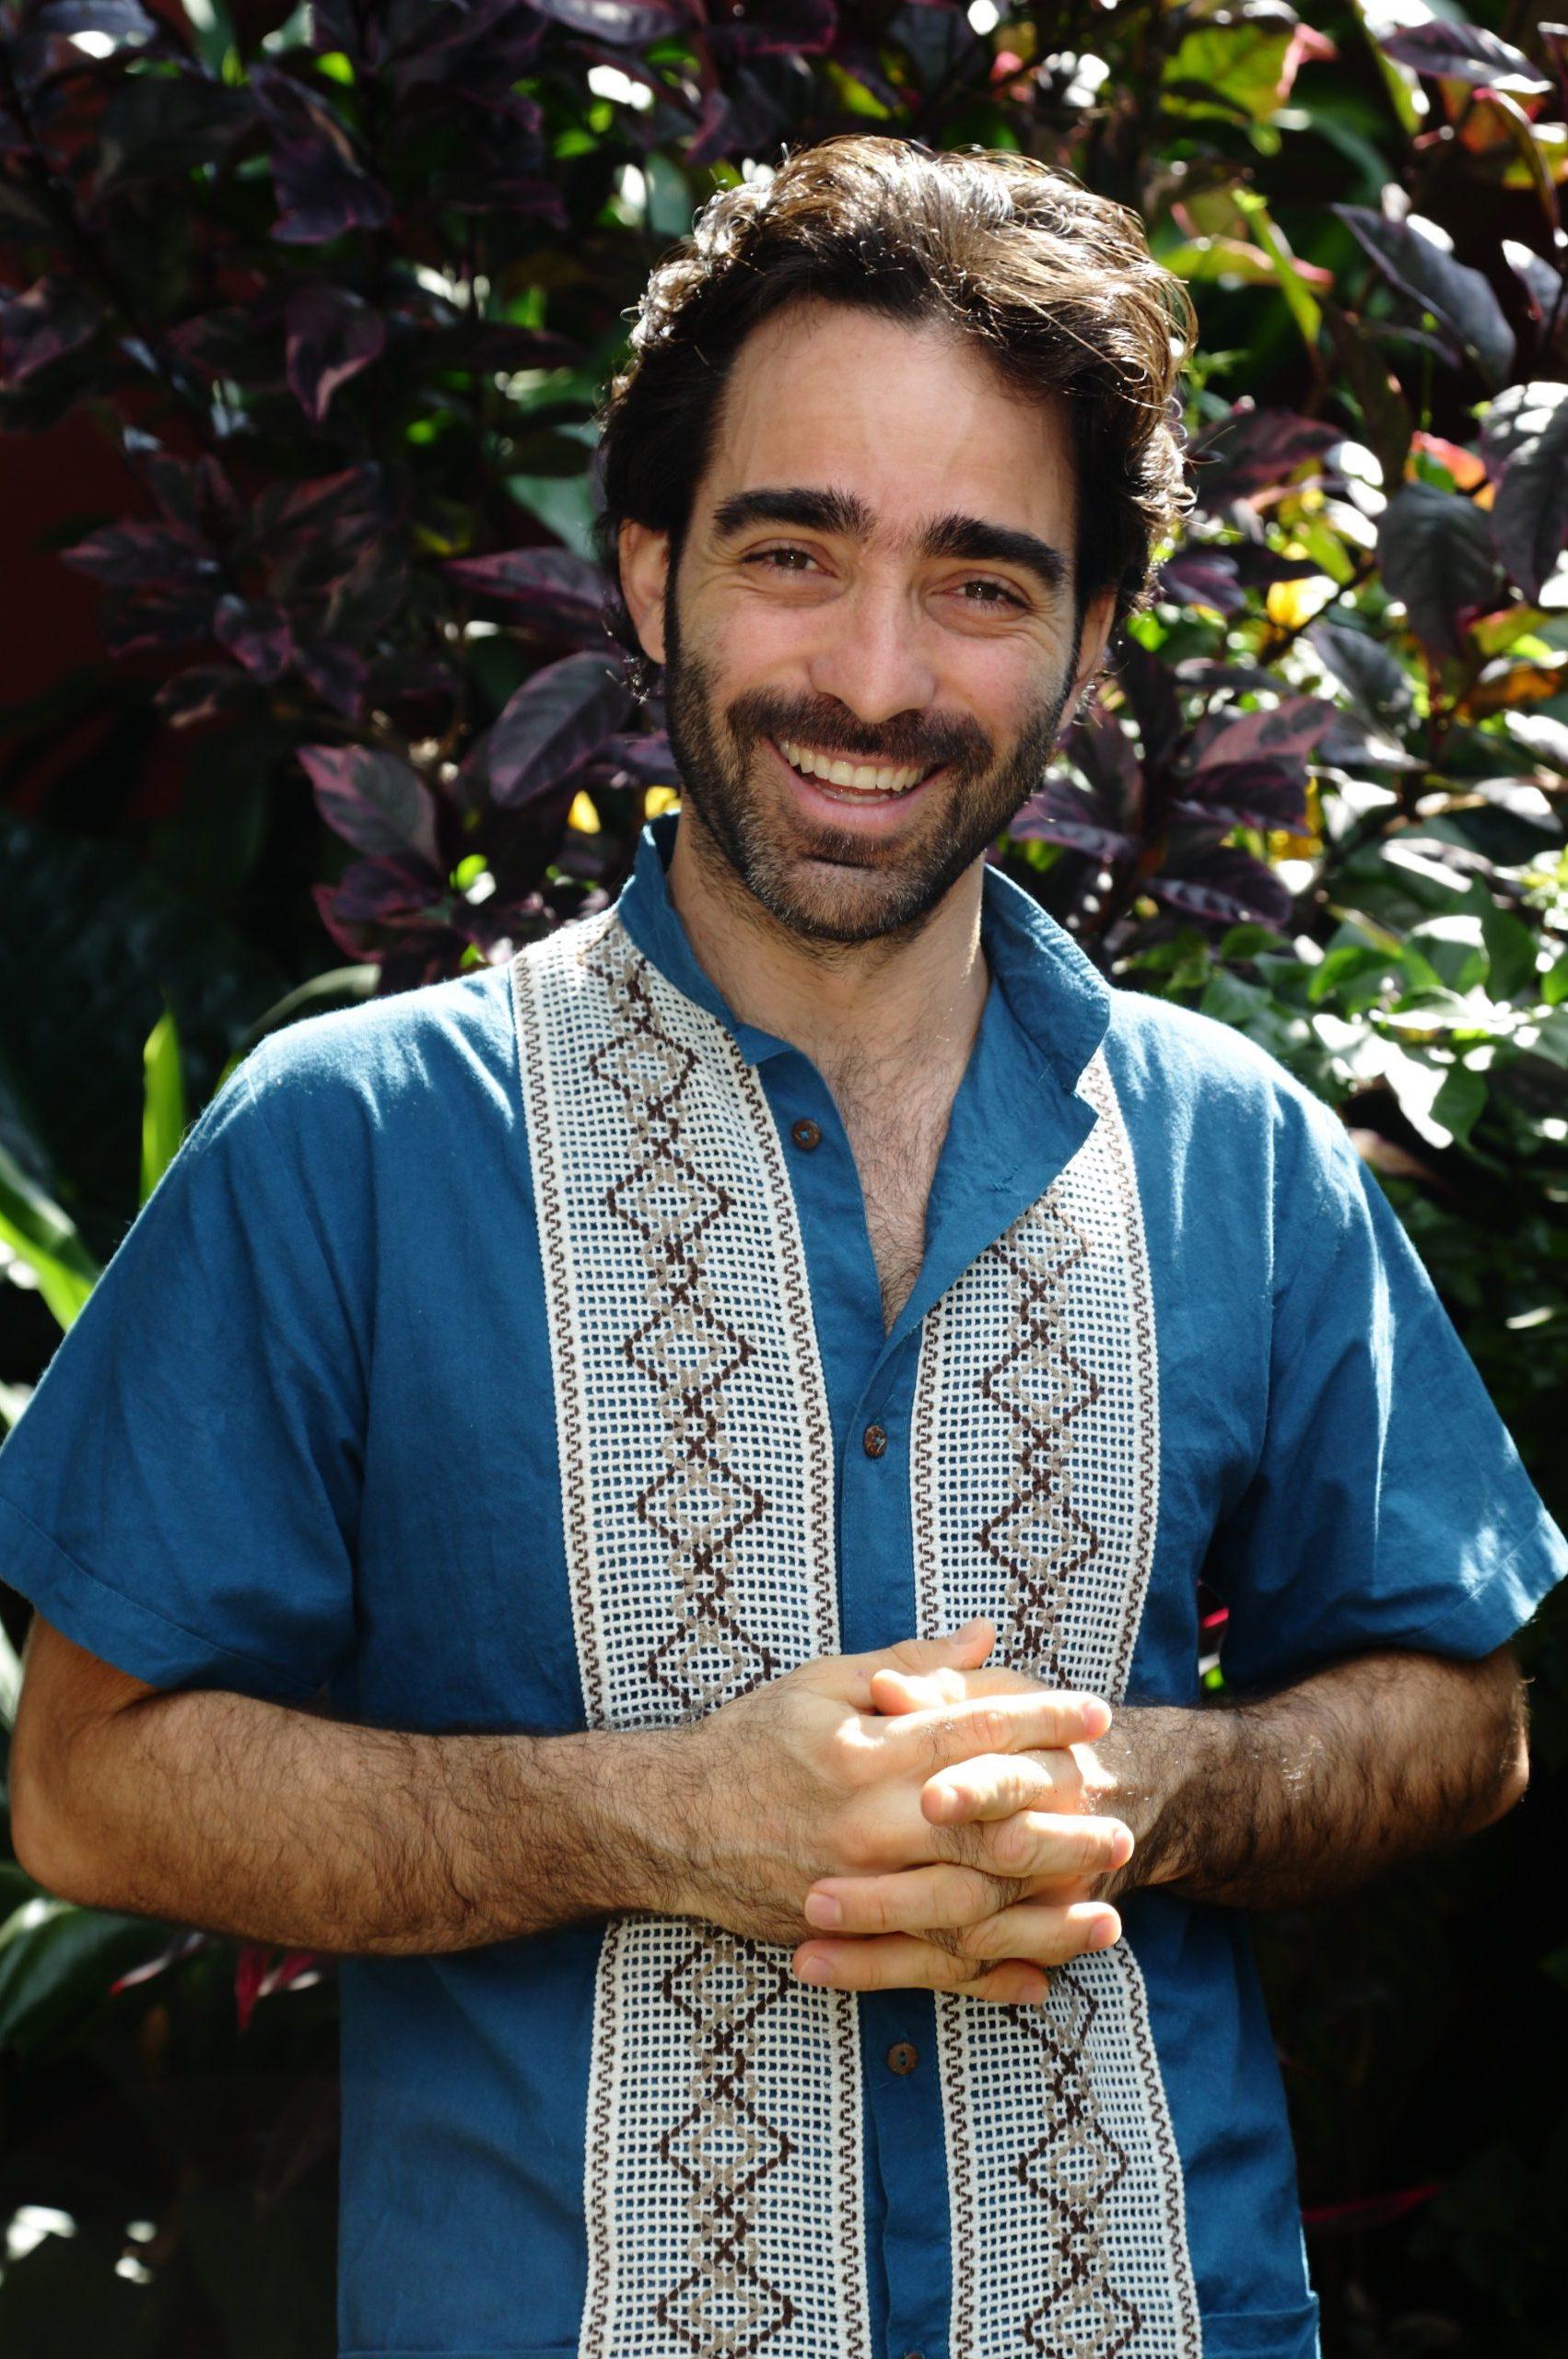 Juan Manuel Peña